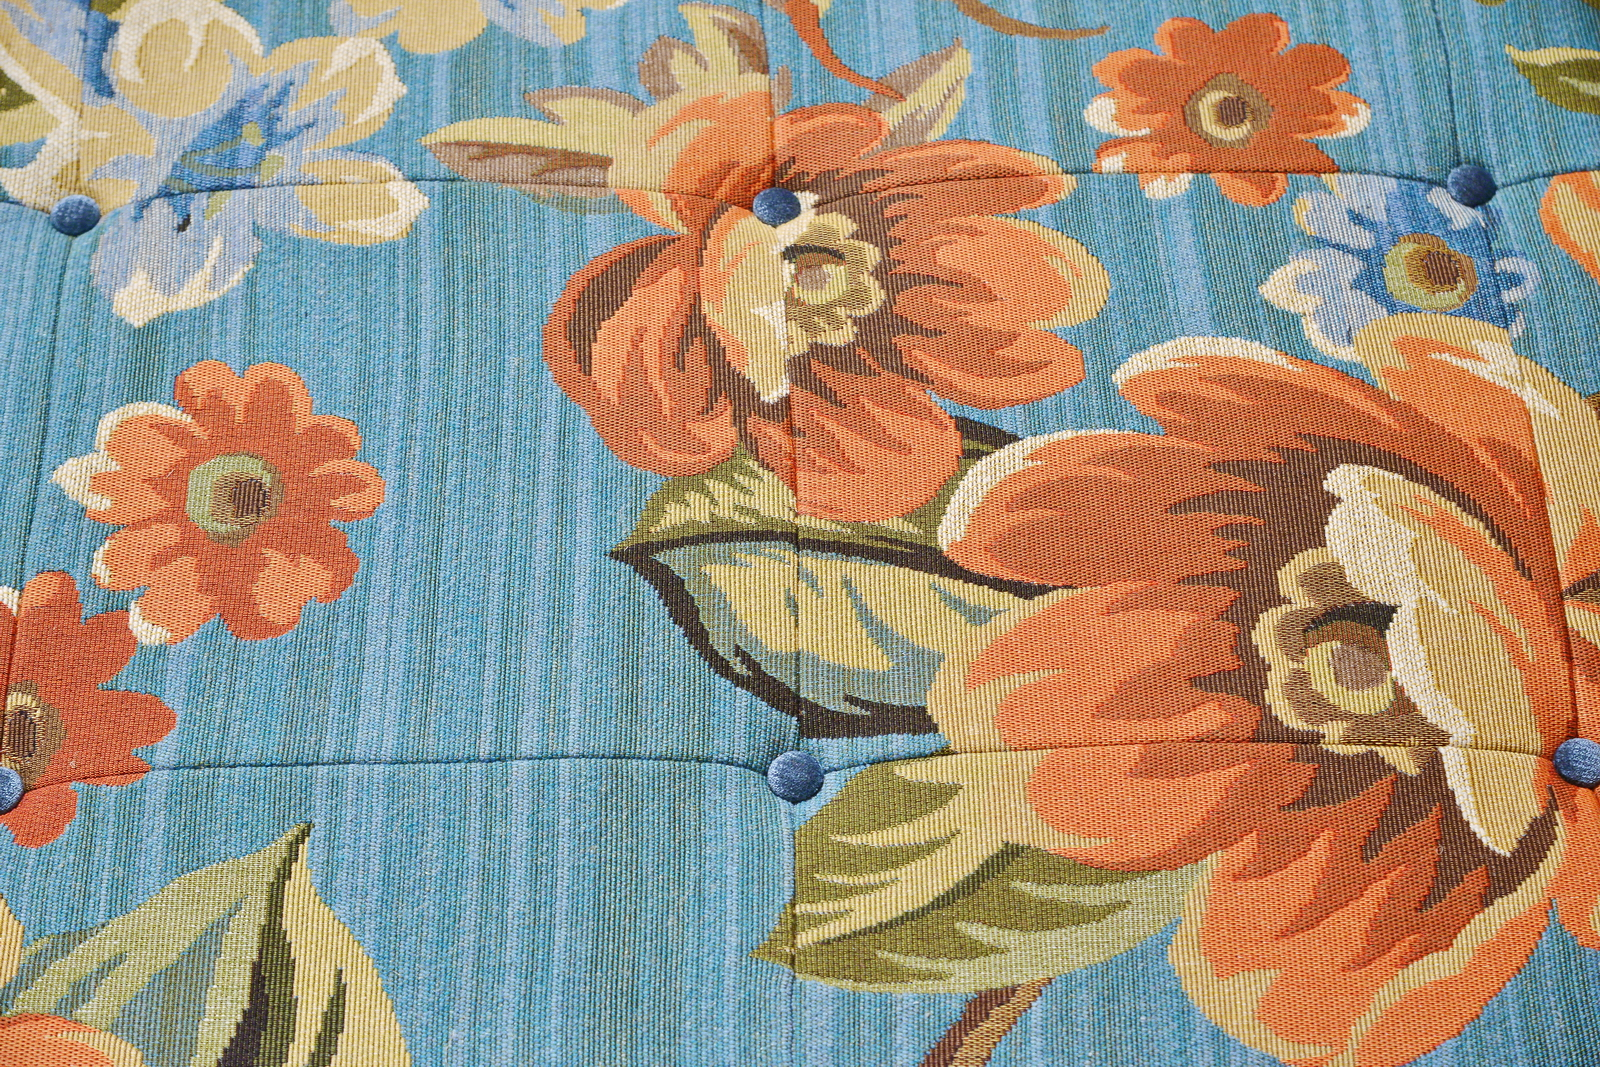 PTendercool-Sofa-PT76-BS1-TE-NO-JD&CO (Garden Tapestry)-190903-08